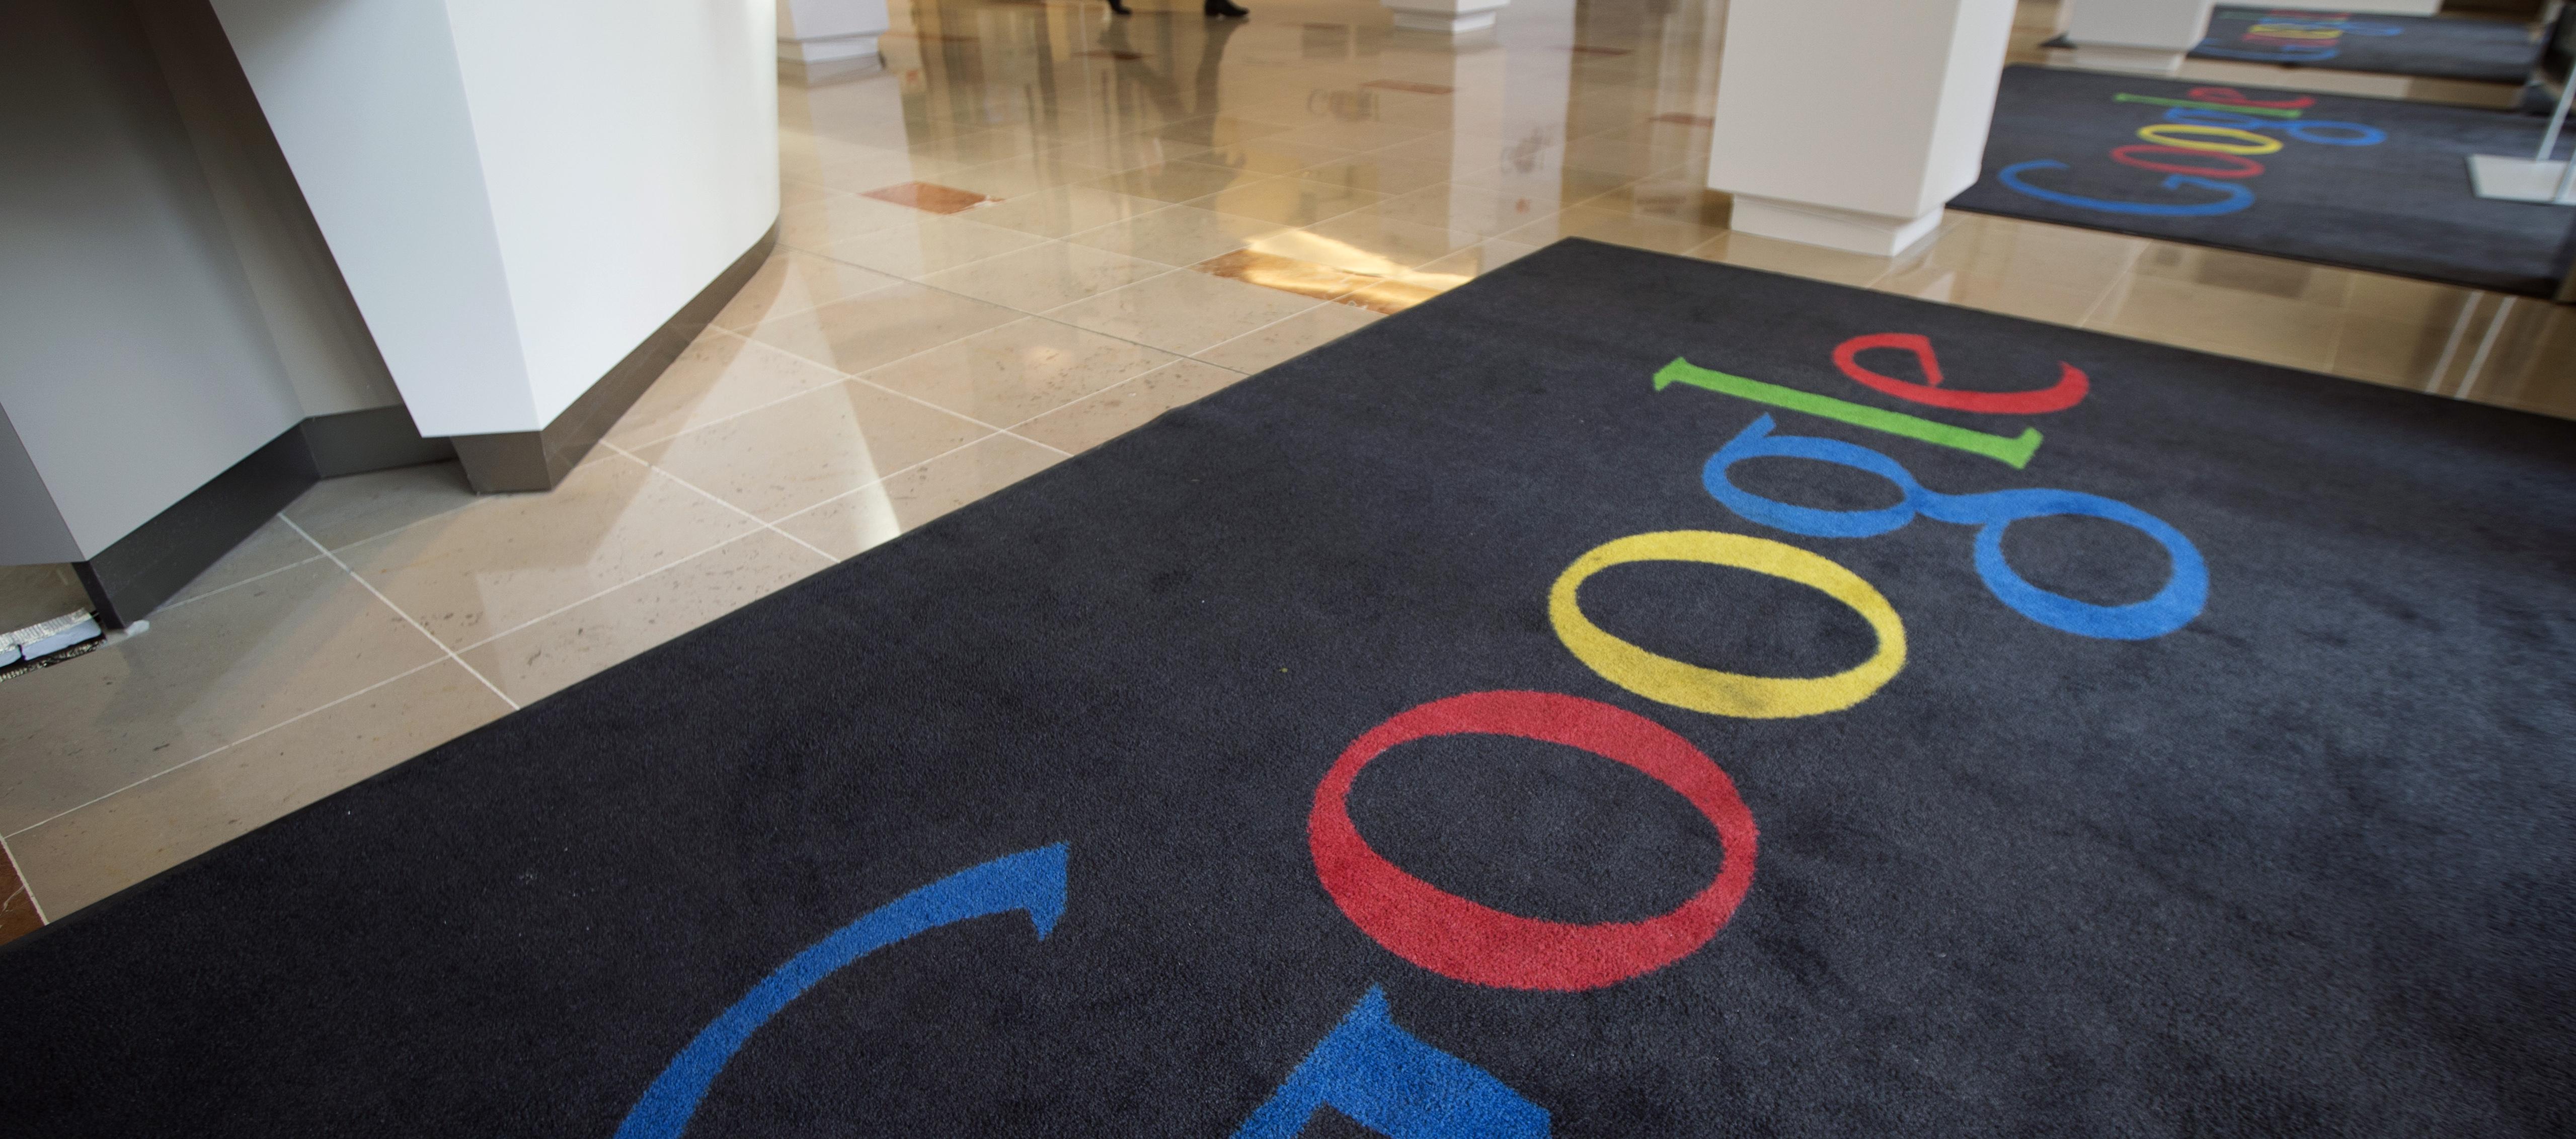 Google Begins Testing Domain Registrations